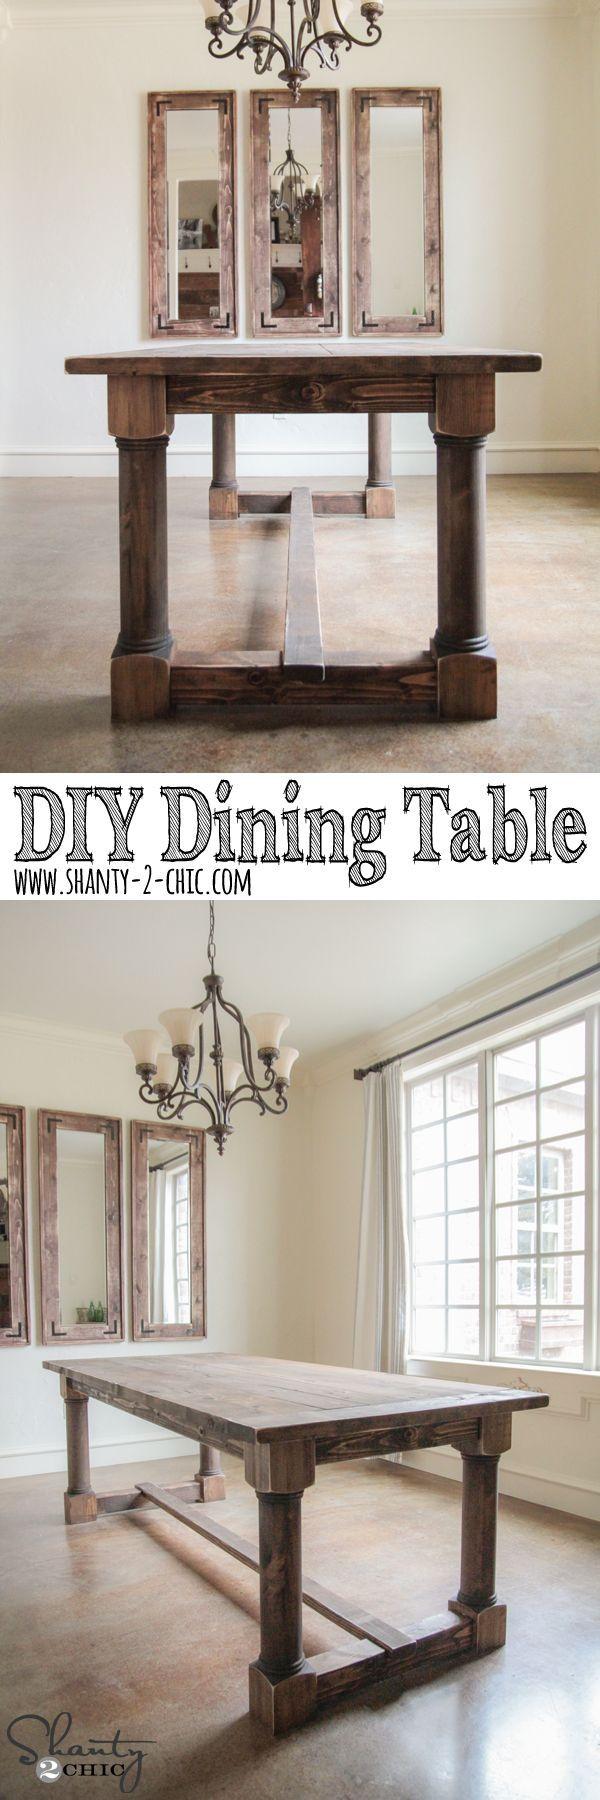 38 best Dining Room DIY Plans images on Pinterest | Dining room ...